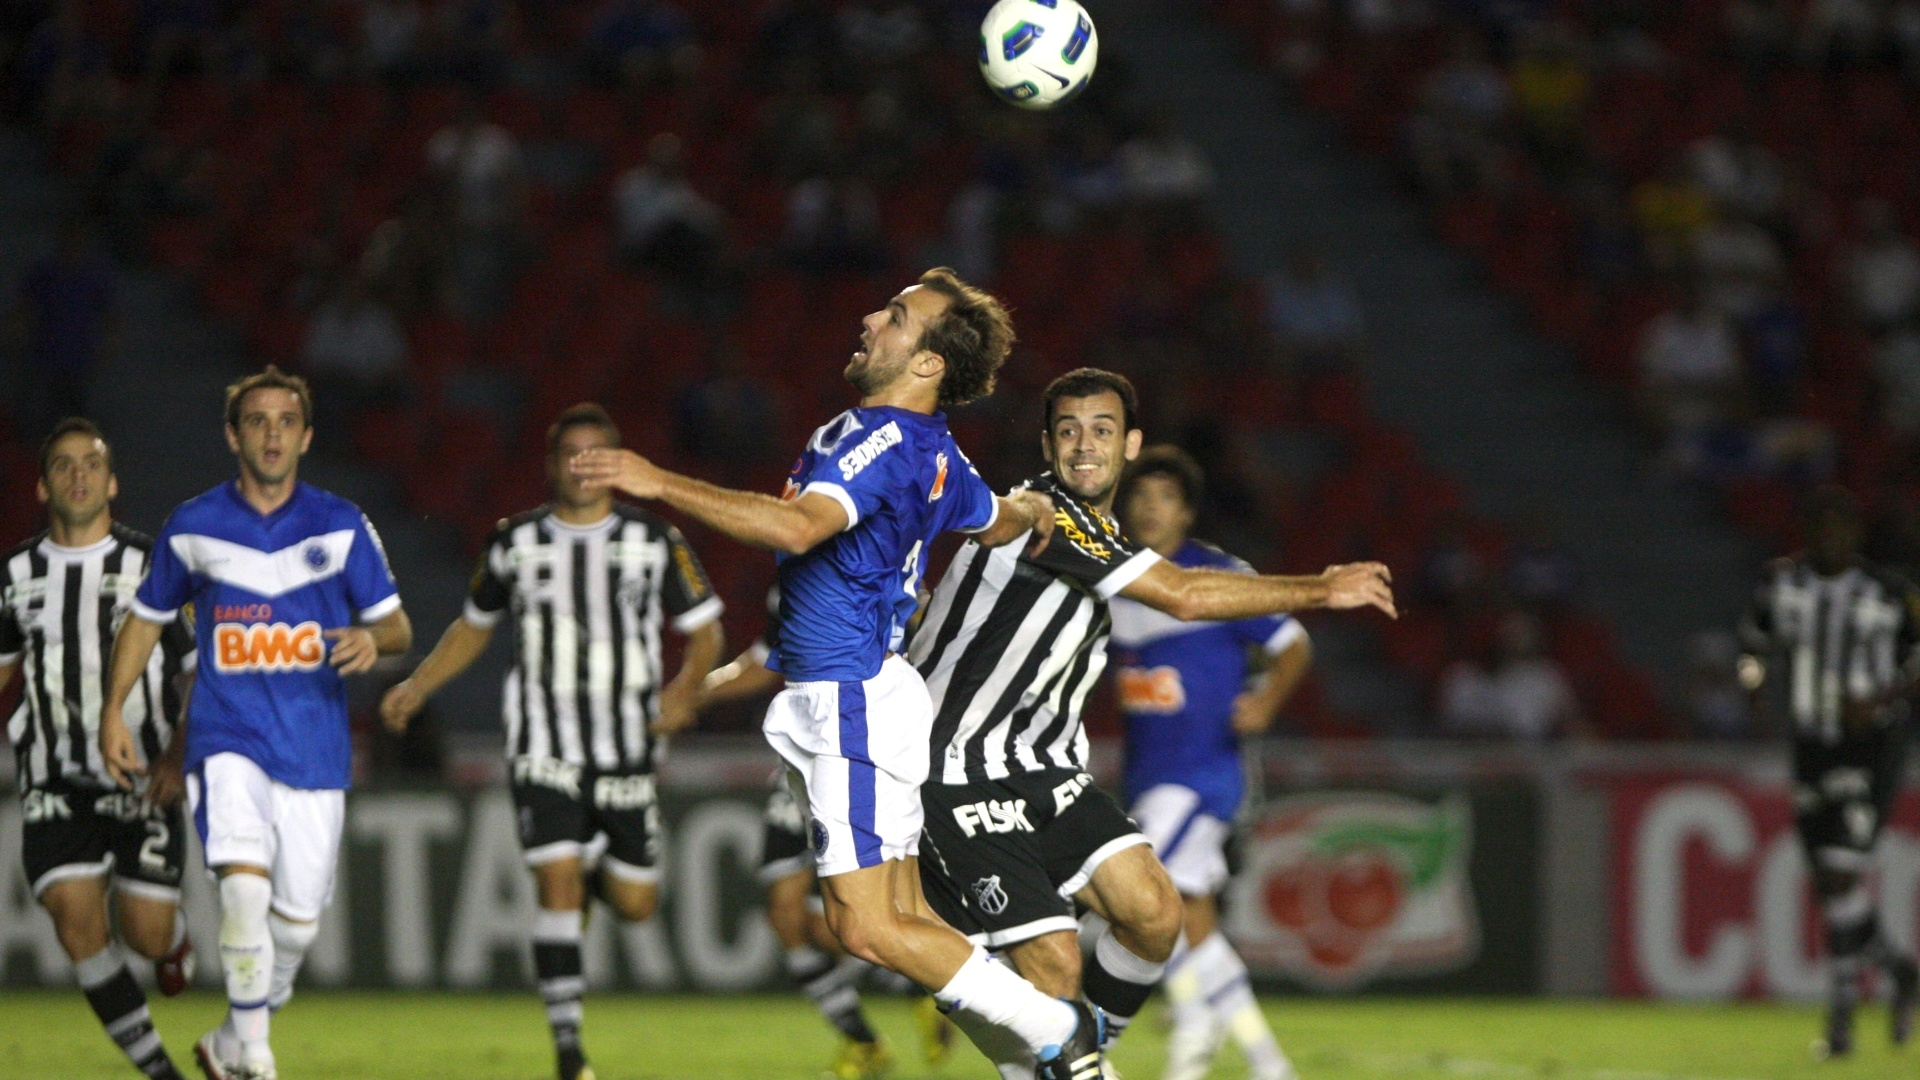 Roger disputa a bola com marcador durante partida entre Cruzeiro e Ceará, pelo Campeonato Brasileiro